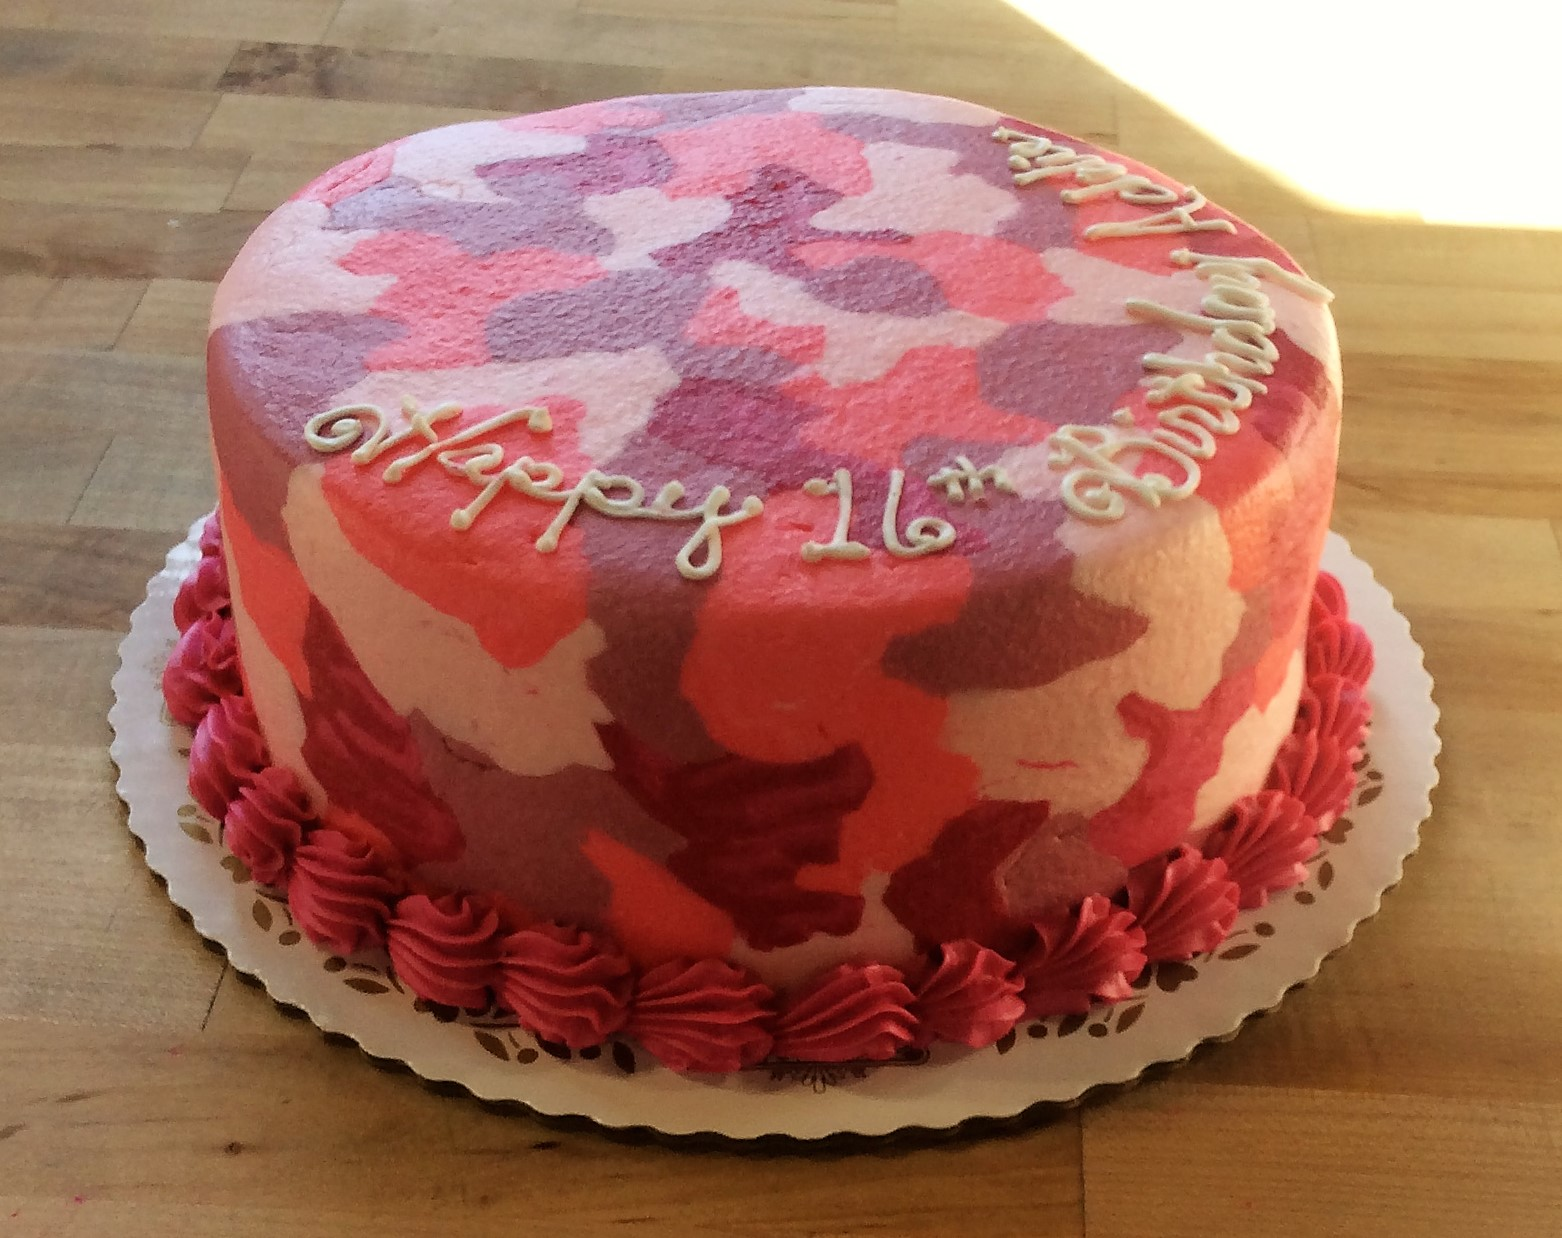 Cake With Camouflage Decoration Trefzger S Bakery